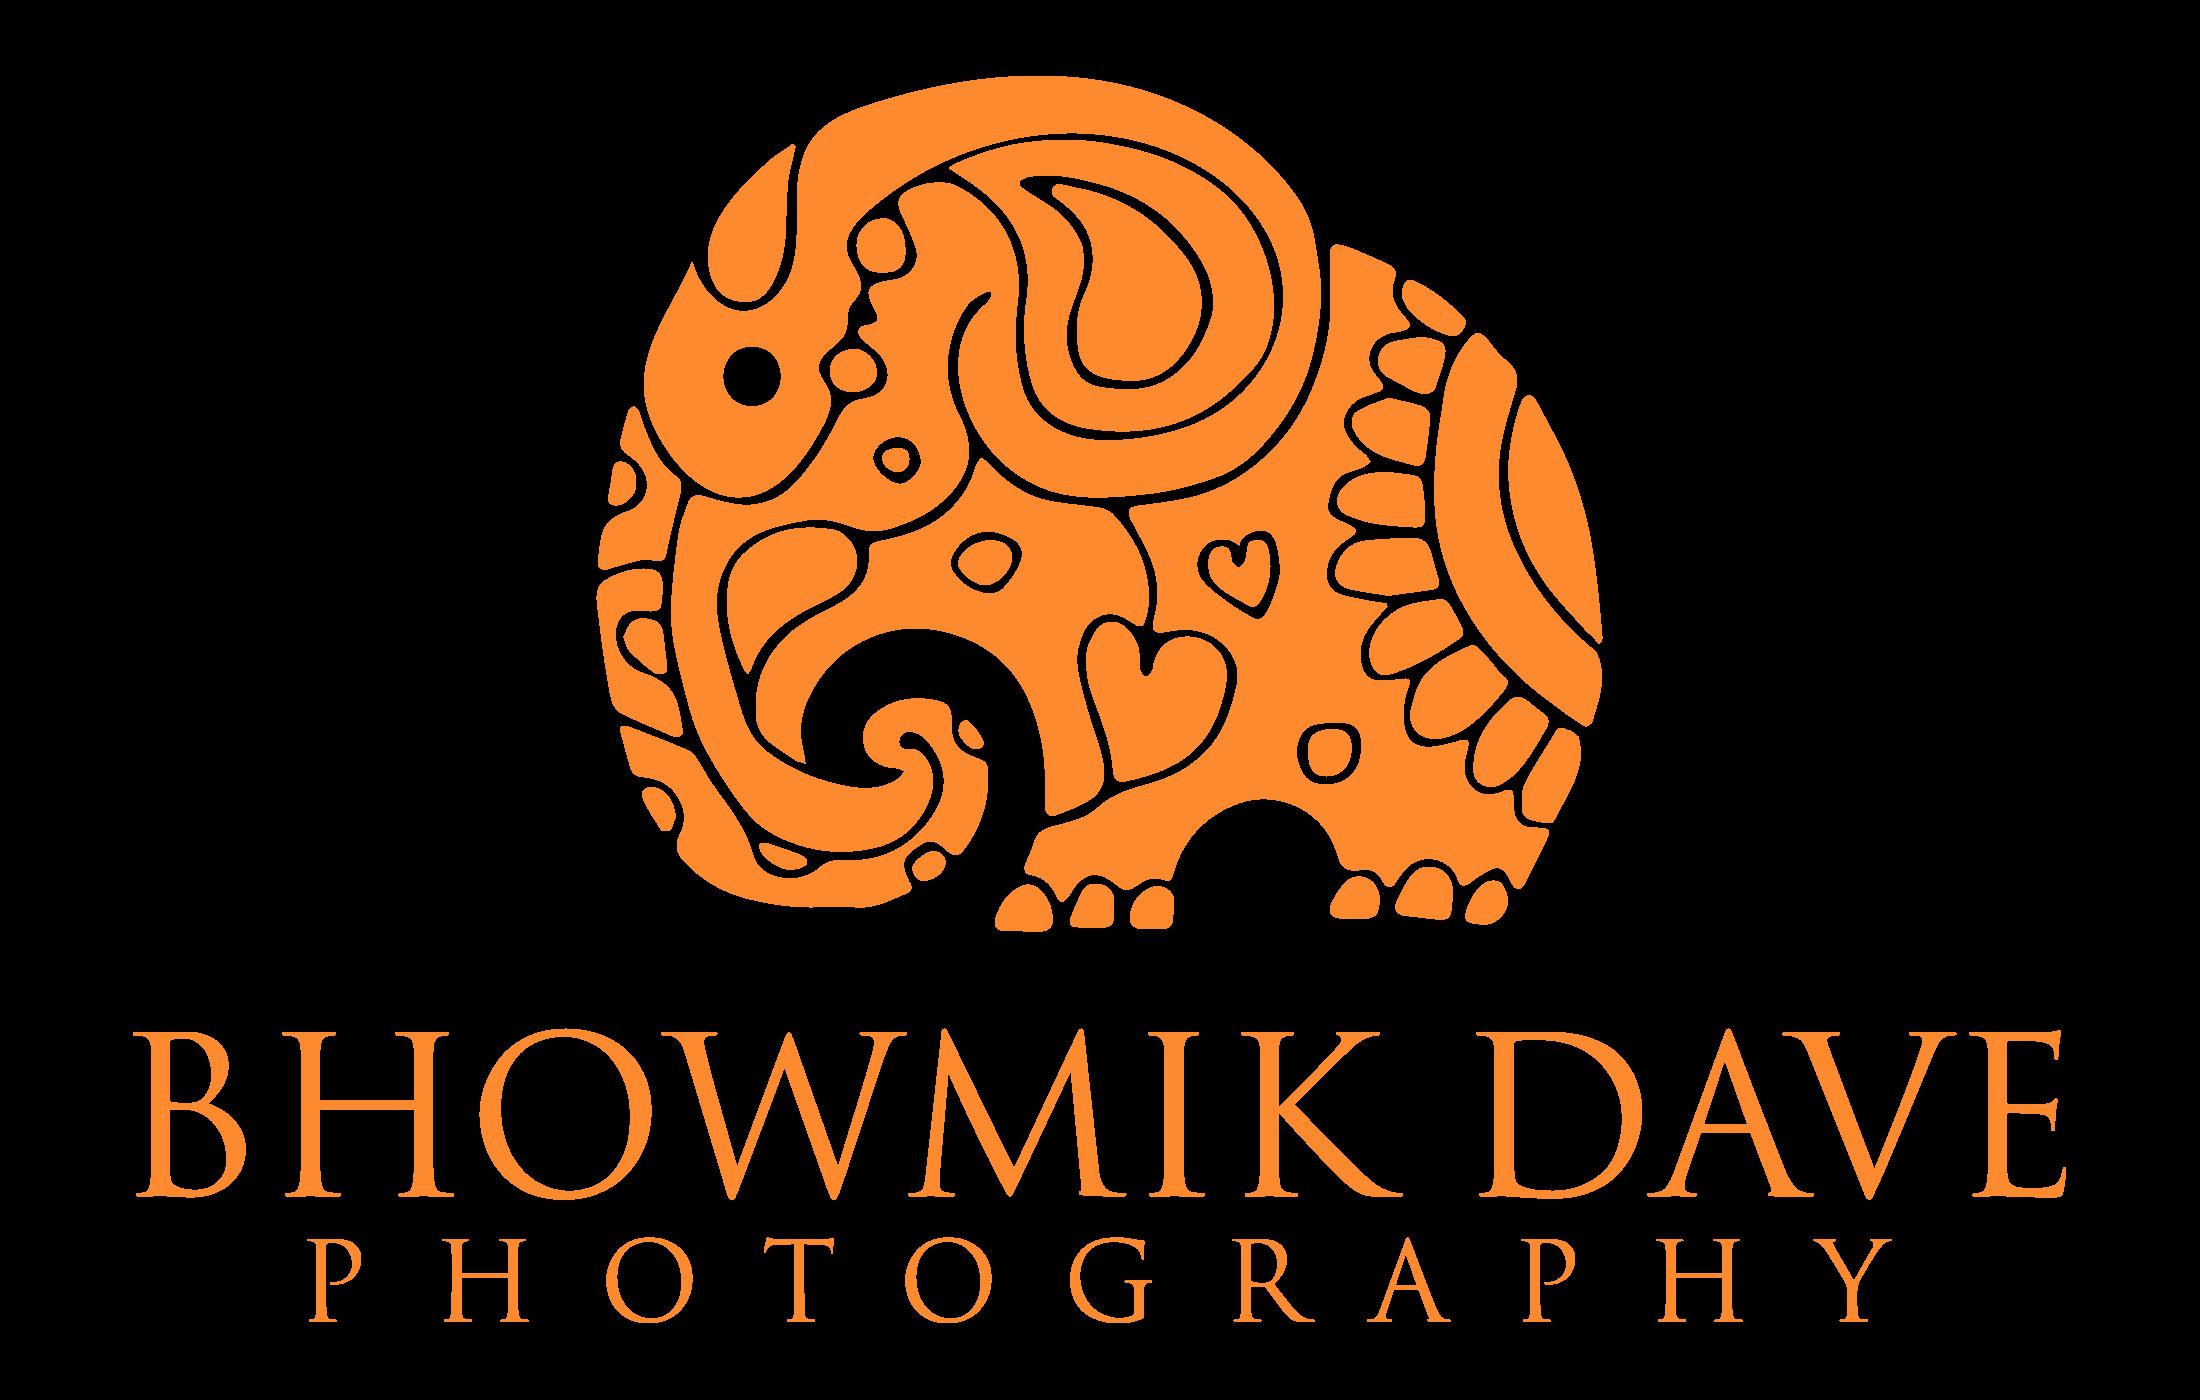 Bhowmik Dave Photography